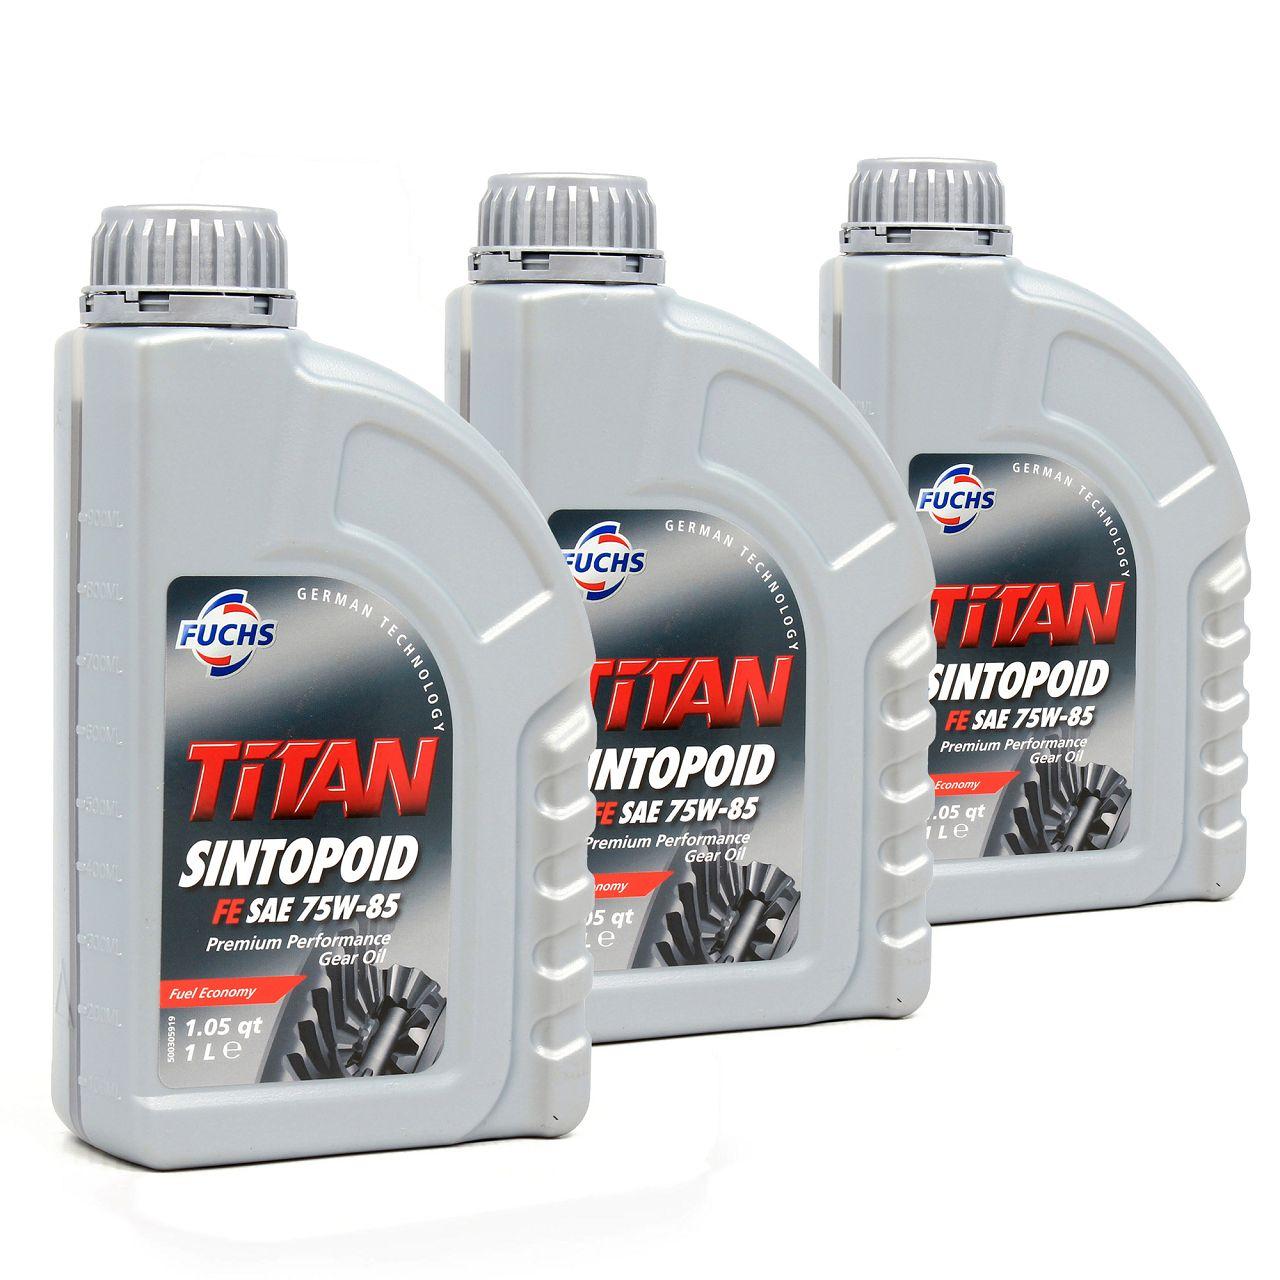 FUCHS Achsöl Achsgetriebeöl TITAN SINTOPOID FE SAE 75W-85 API GL-5 - 3 Liter